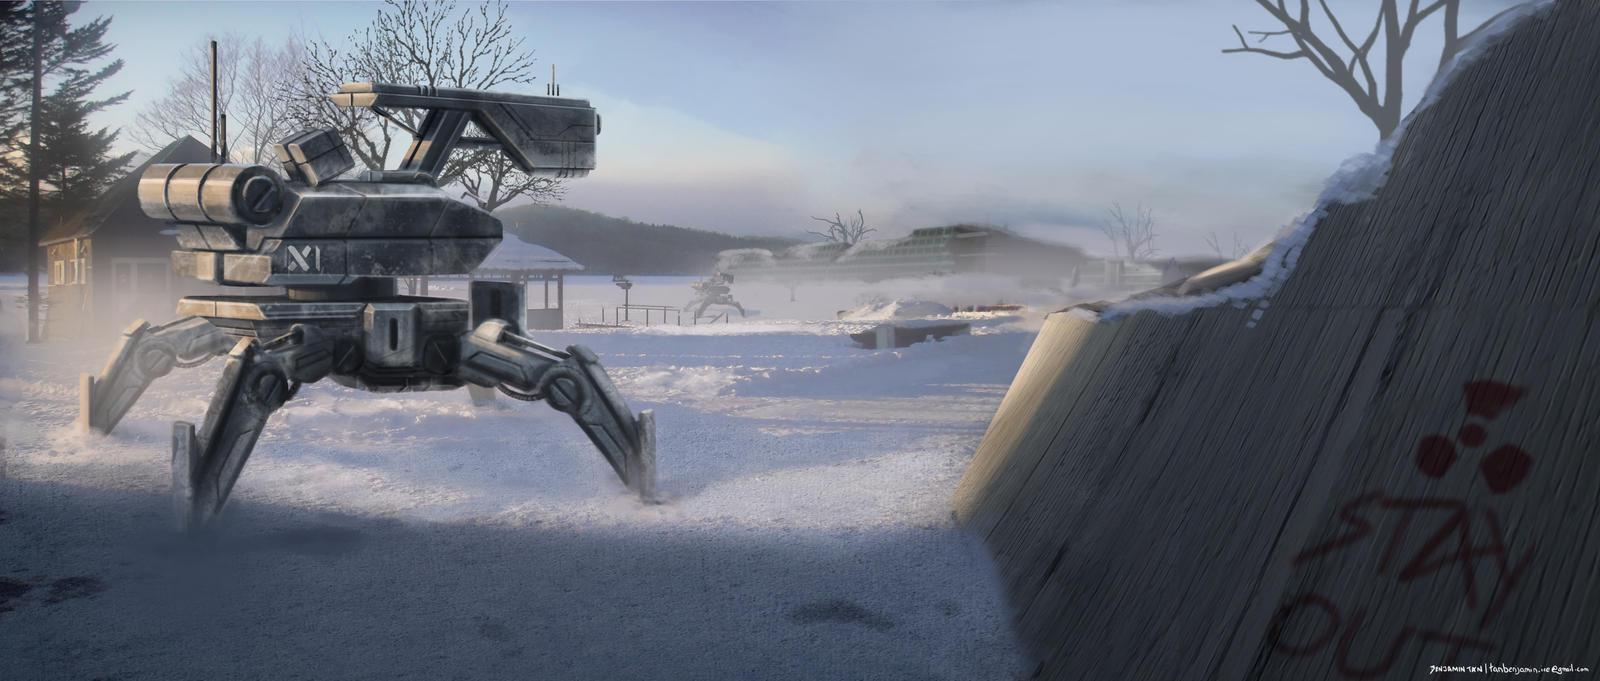 Snow Patrolling Mech by FrostKnight-IcE